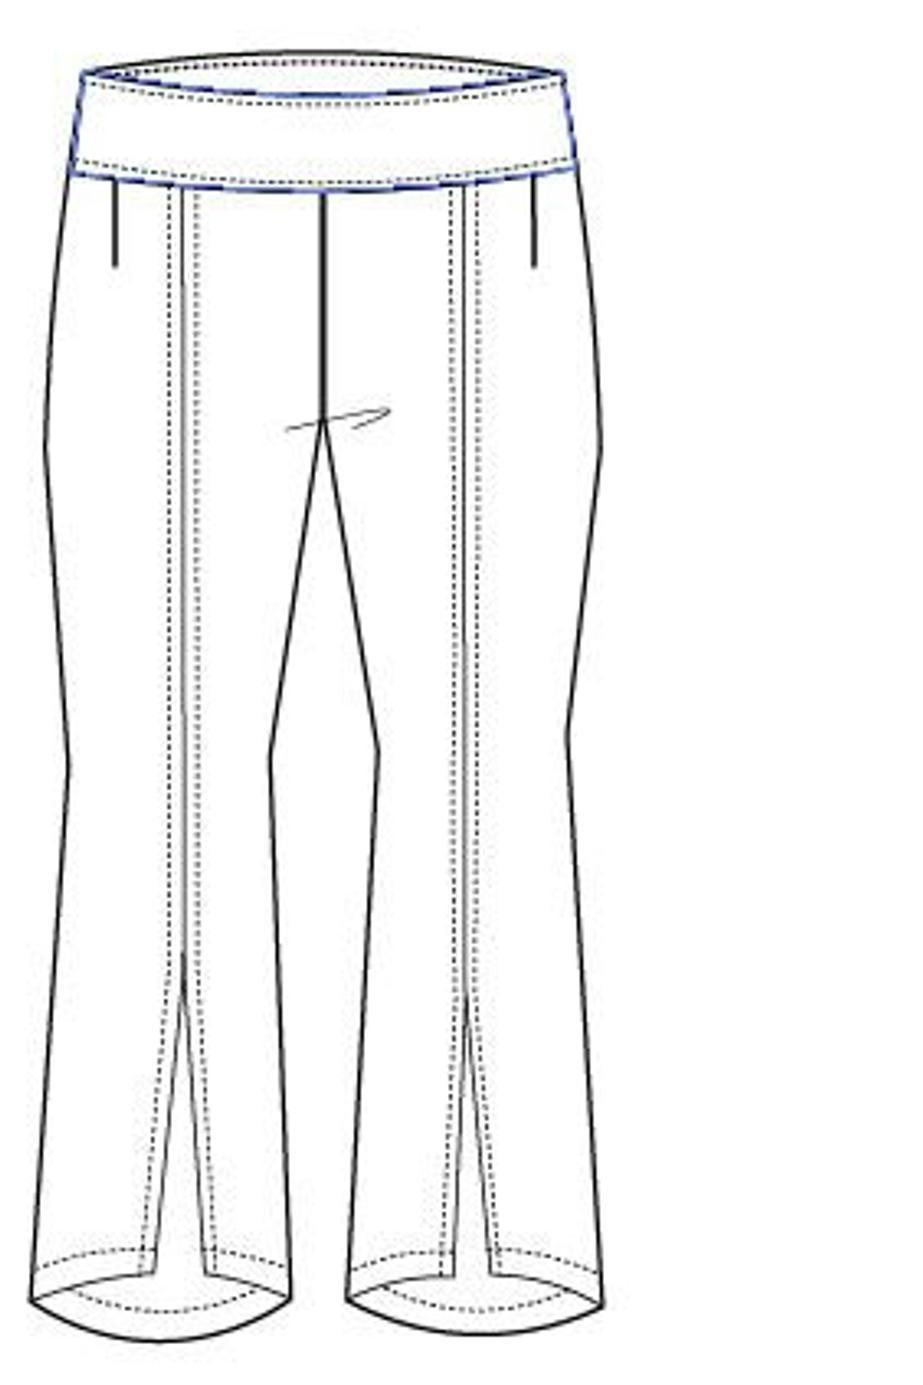 Jasper pants sewing pattern from DG Patterns